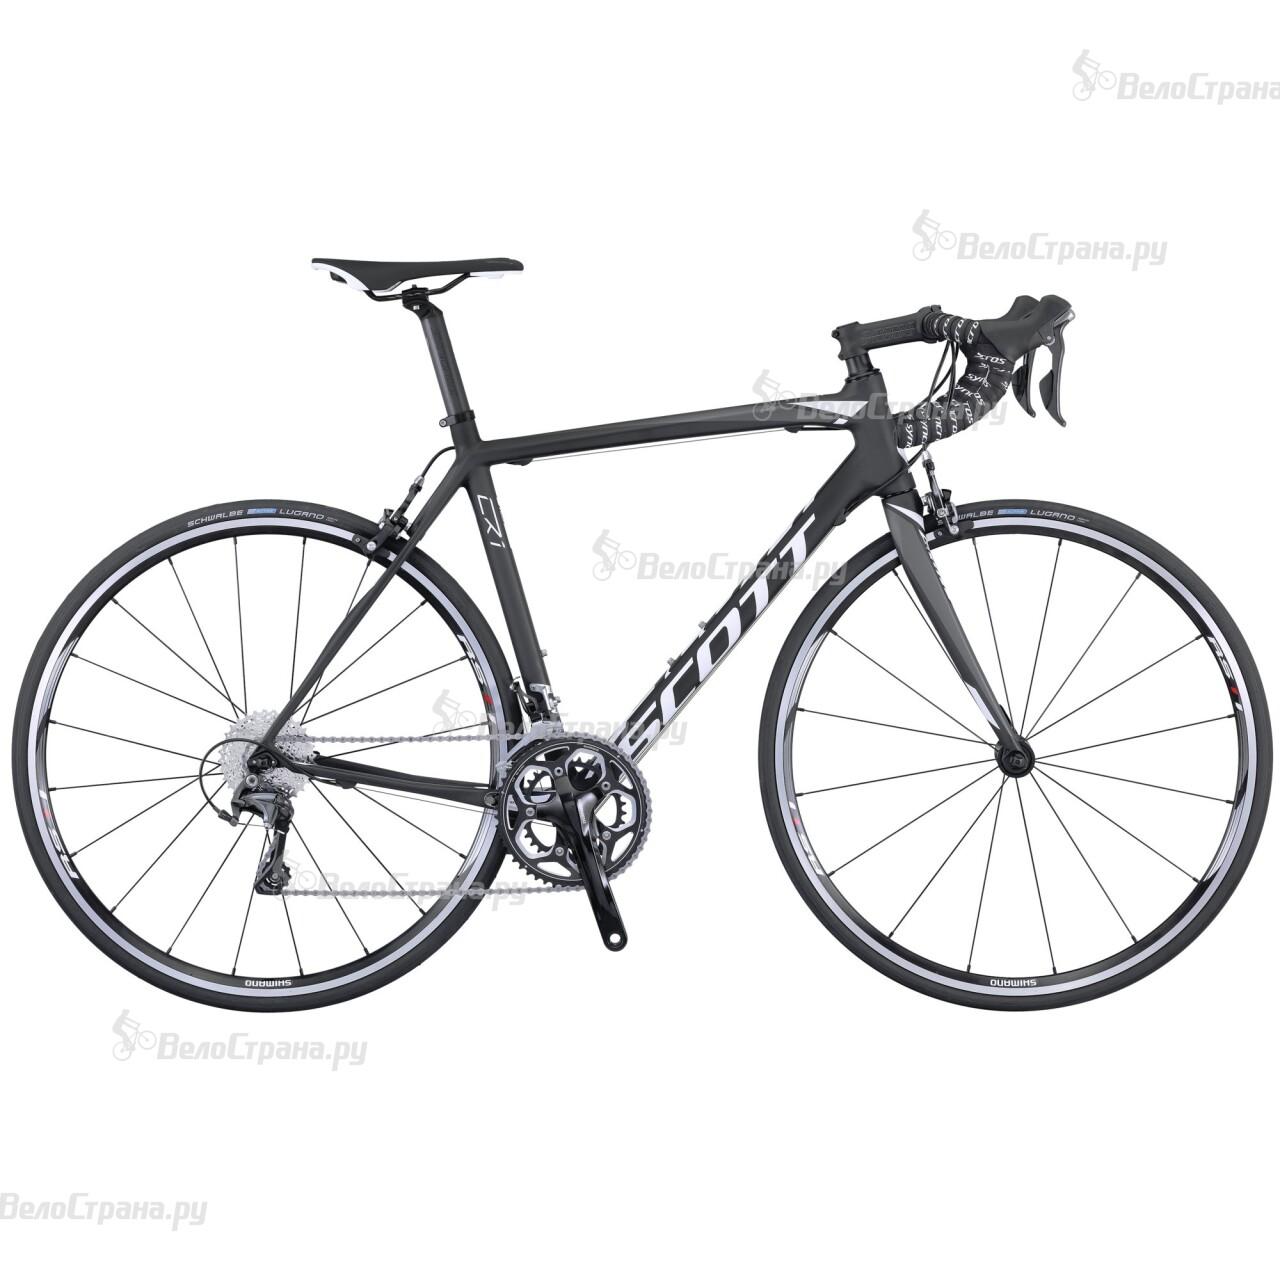 Велосипед Scott CR1 10 (2016) велосипед scott cr1 20 2017